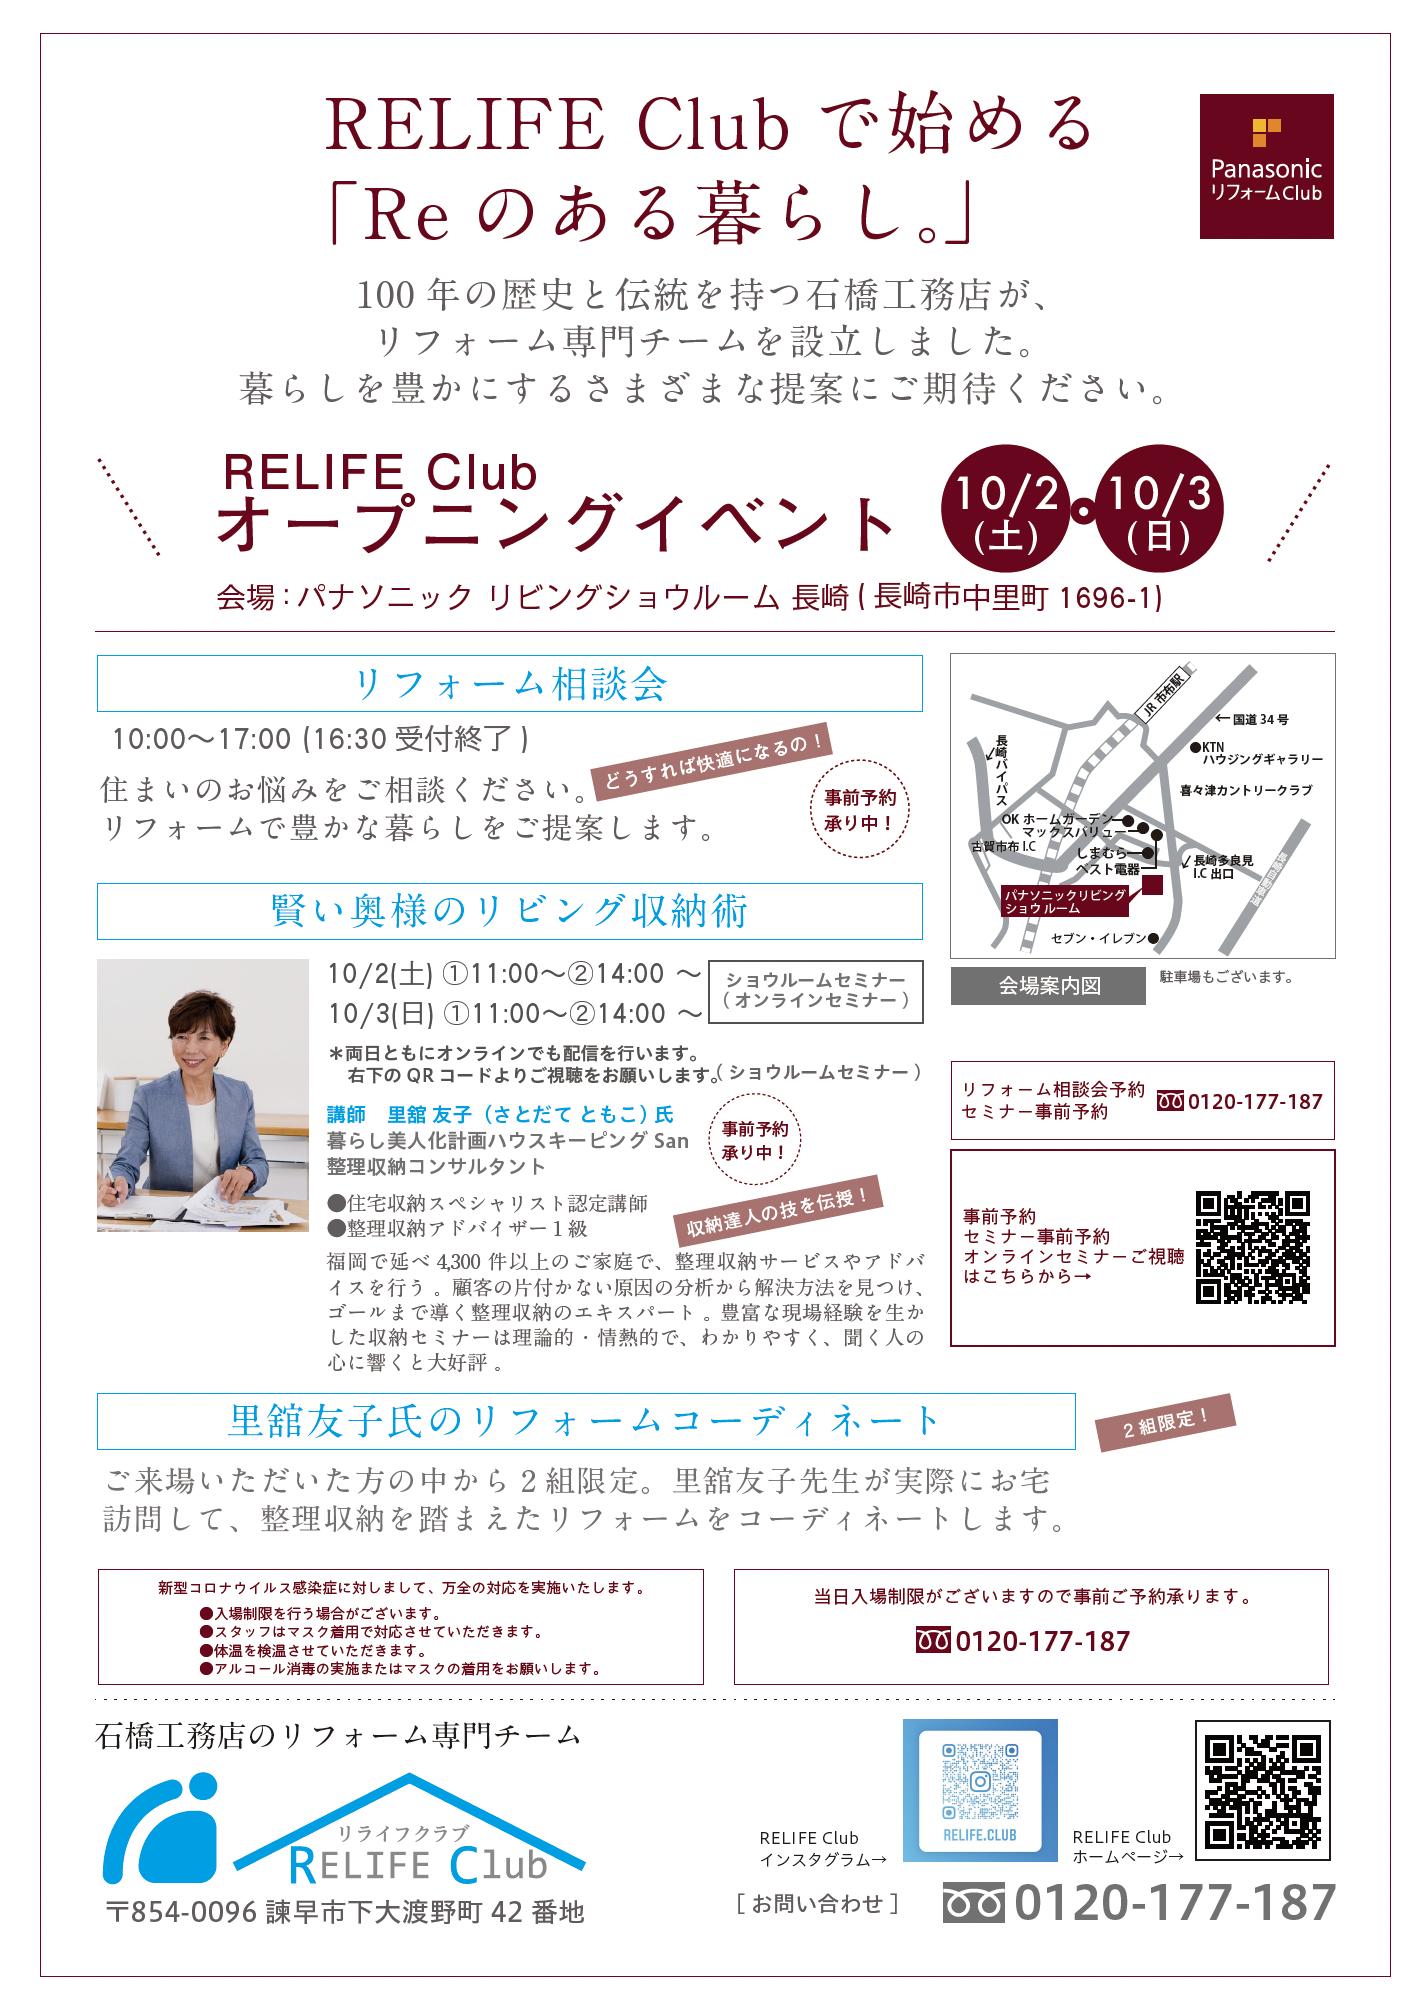 RELIFE Club10月1日スタート!